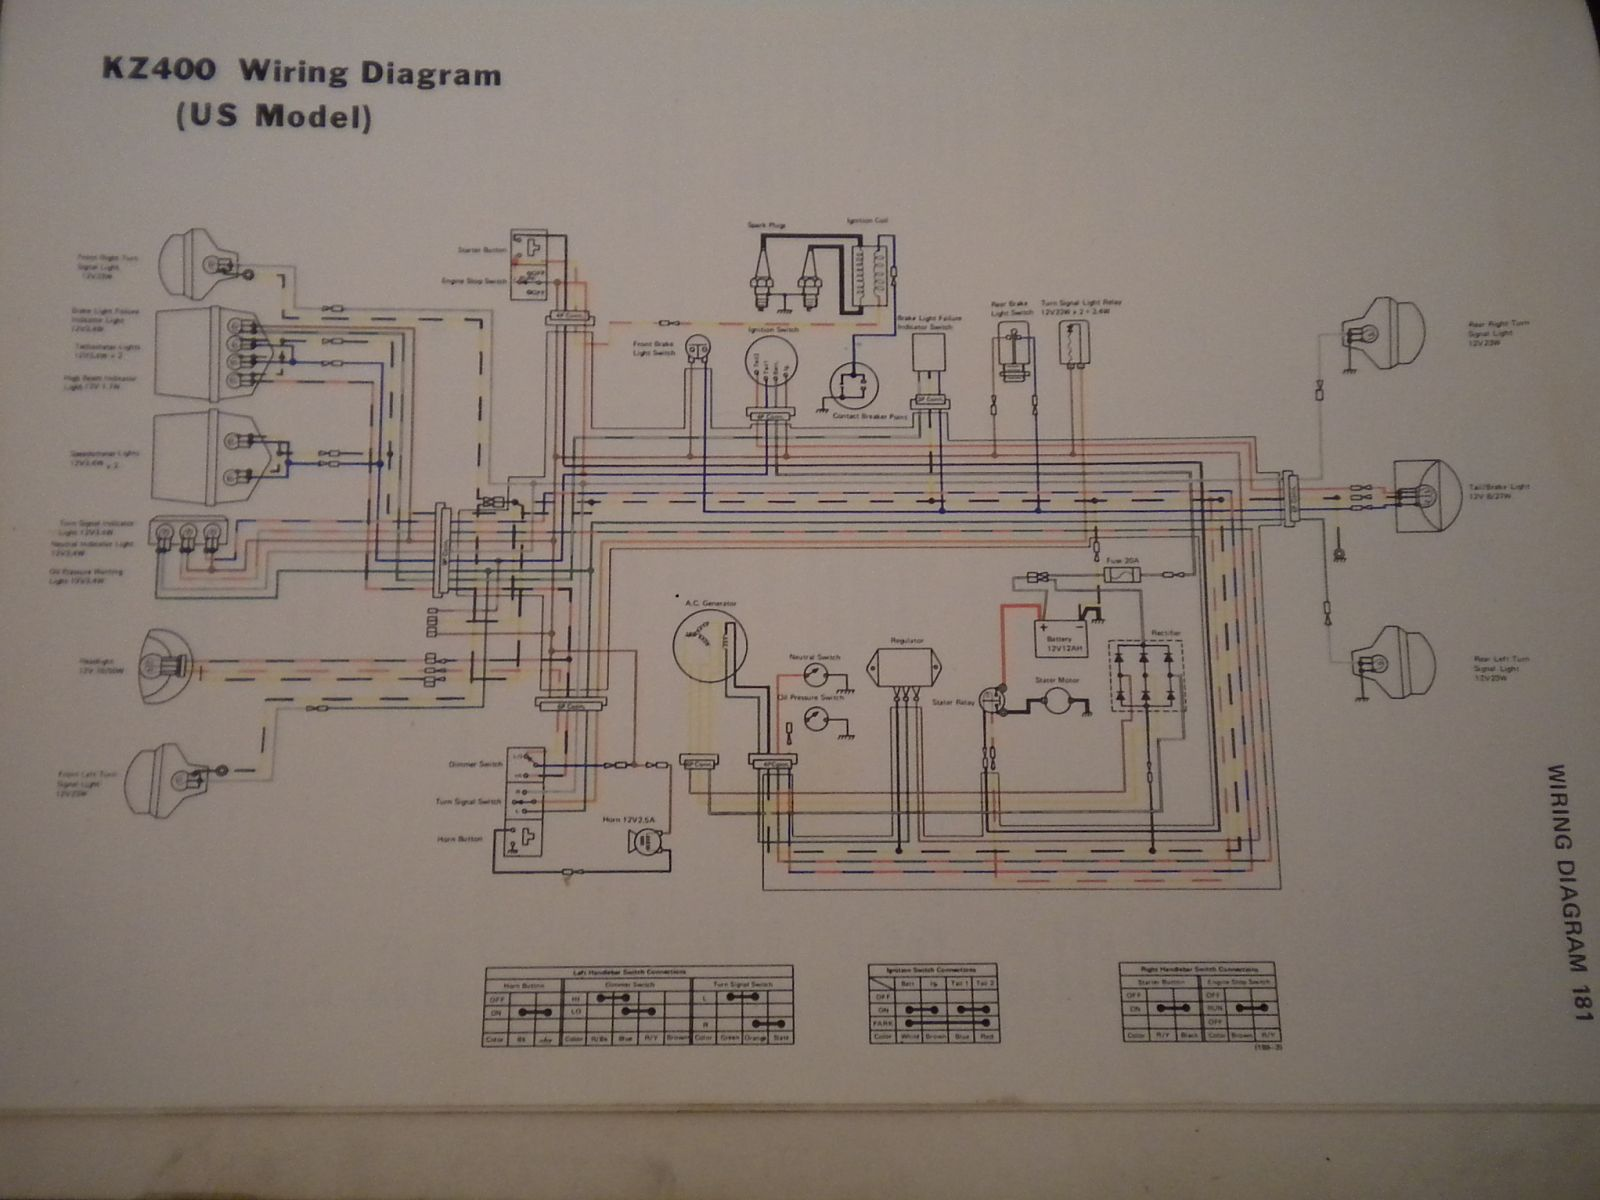 1981 cb750 wiring diagram shovelhead engine 81 kz440 get free image about